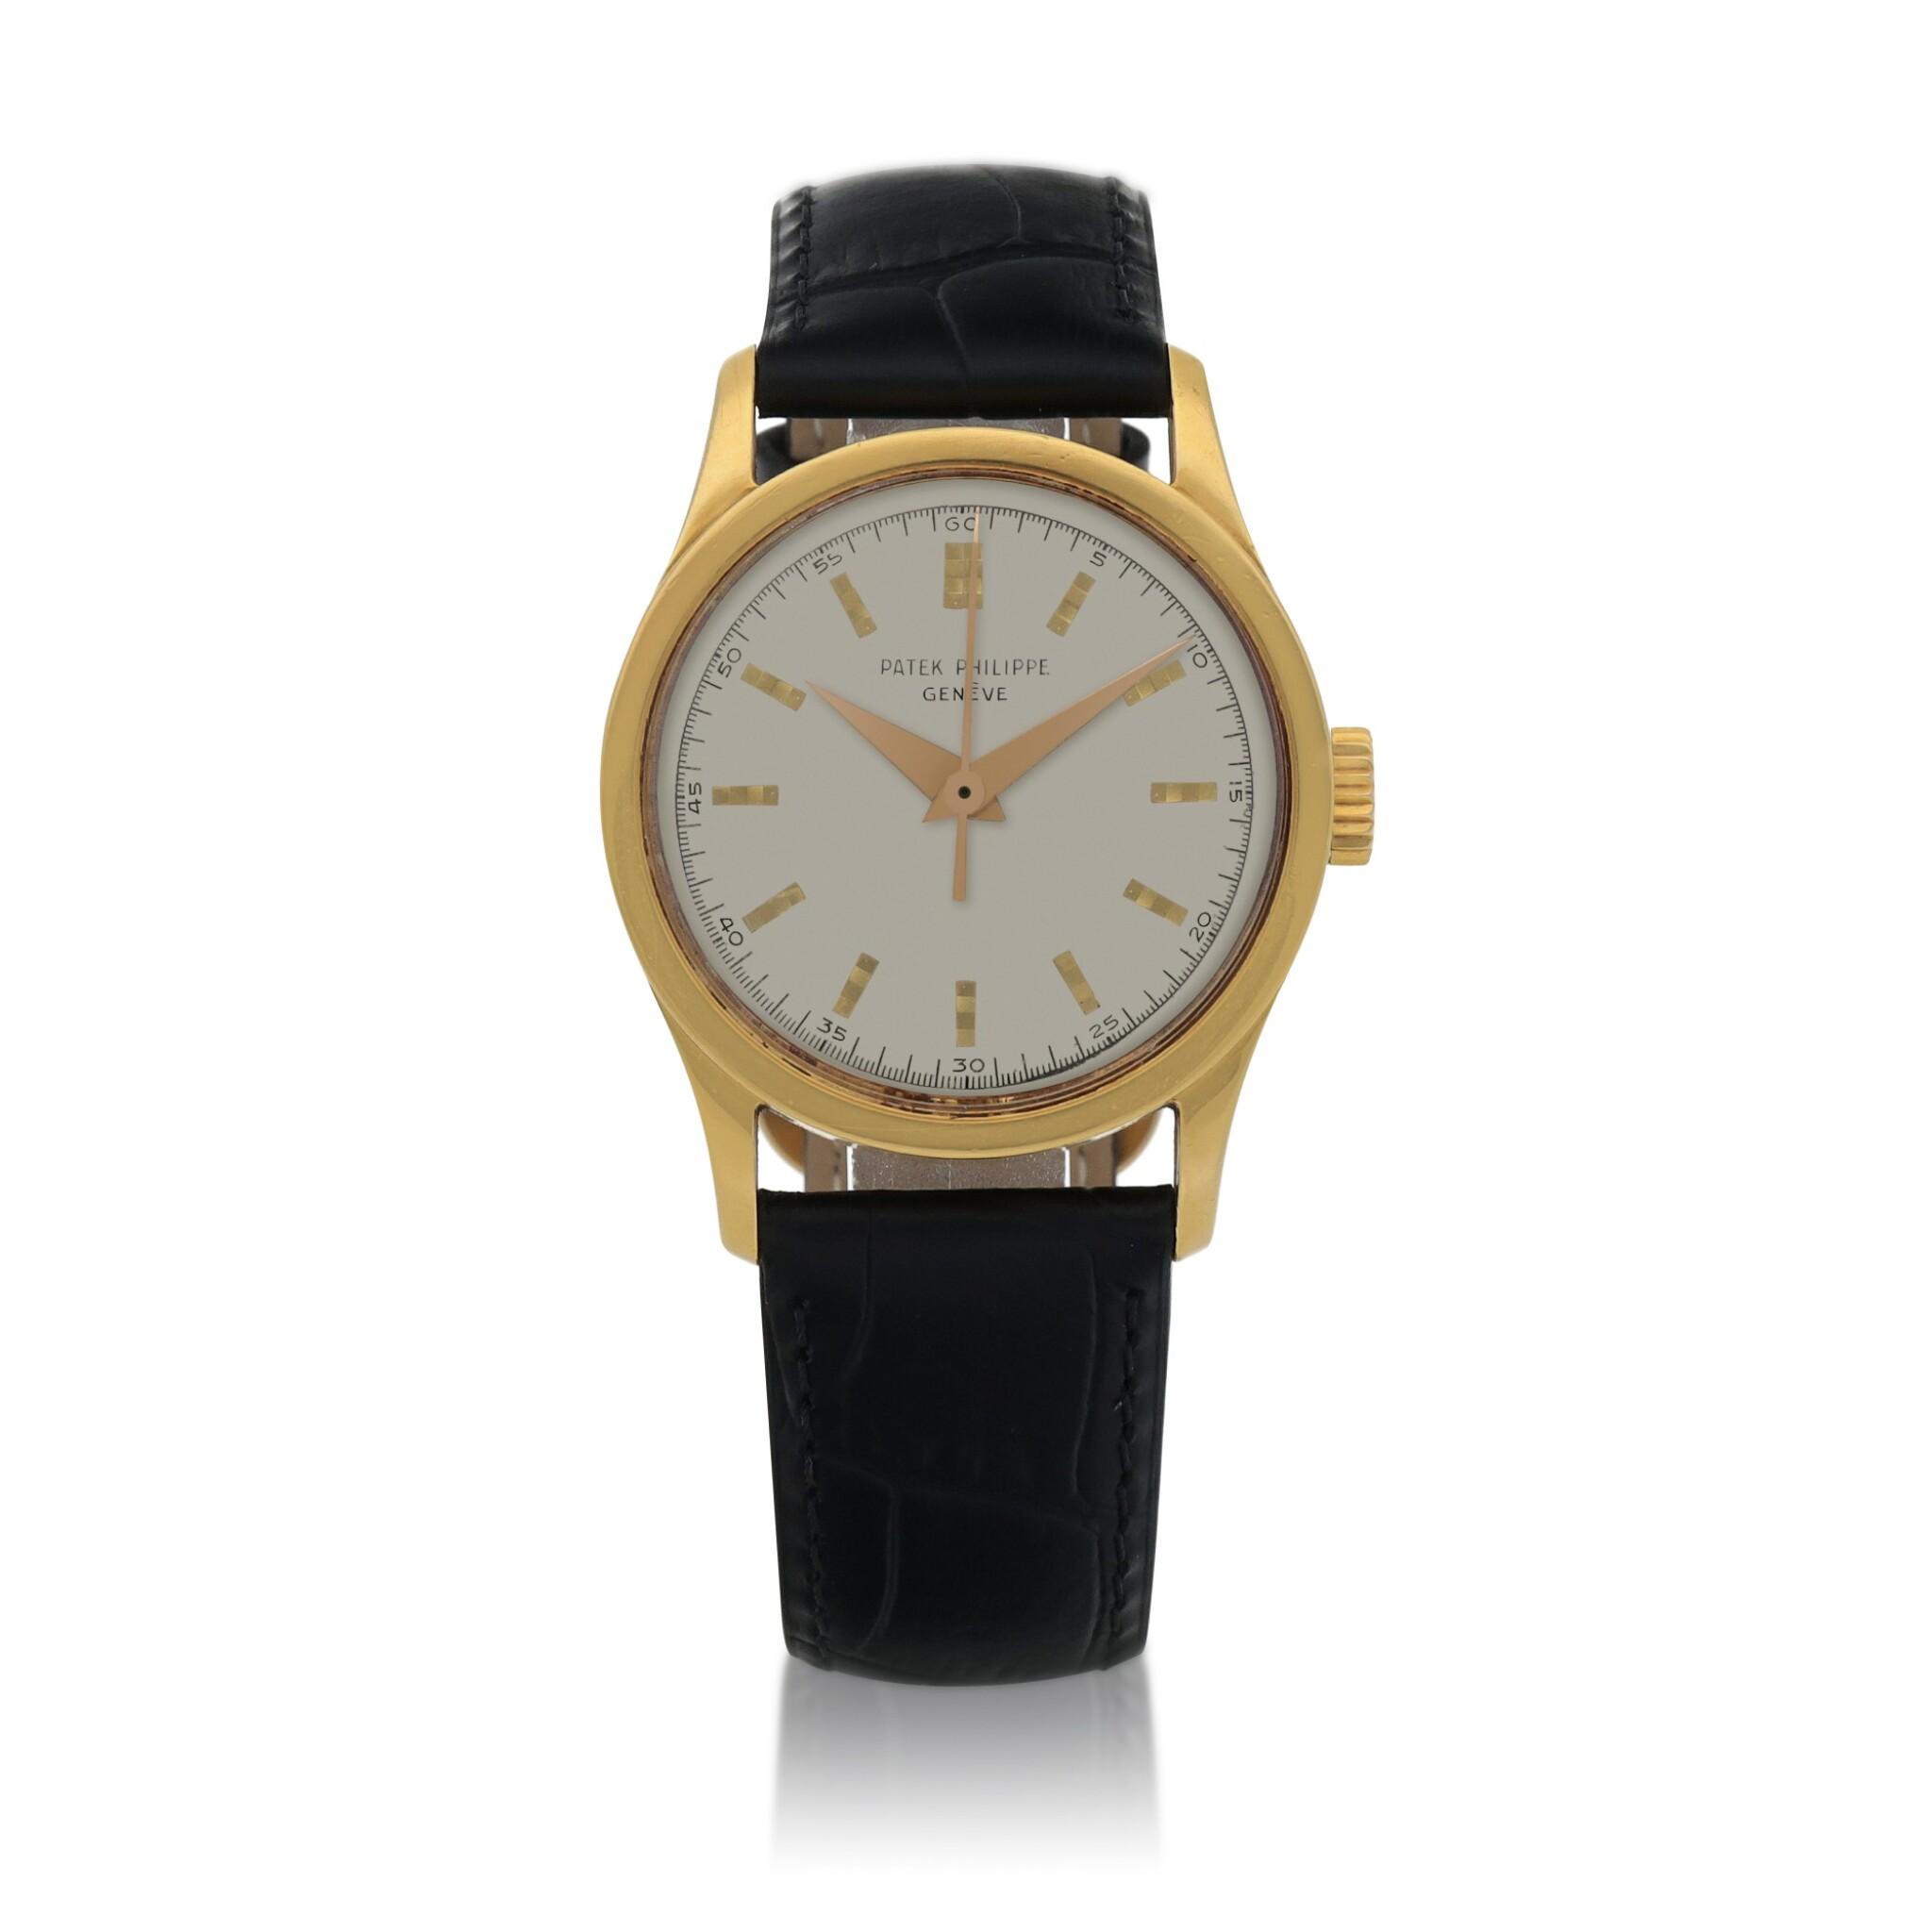 View full screen - View 1 of Lot 85. Ref. 2555 Yellow Gold Wristwatch Made in 1955 | 百達翡麗 2555型號黃金腕錶,1955年製.